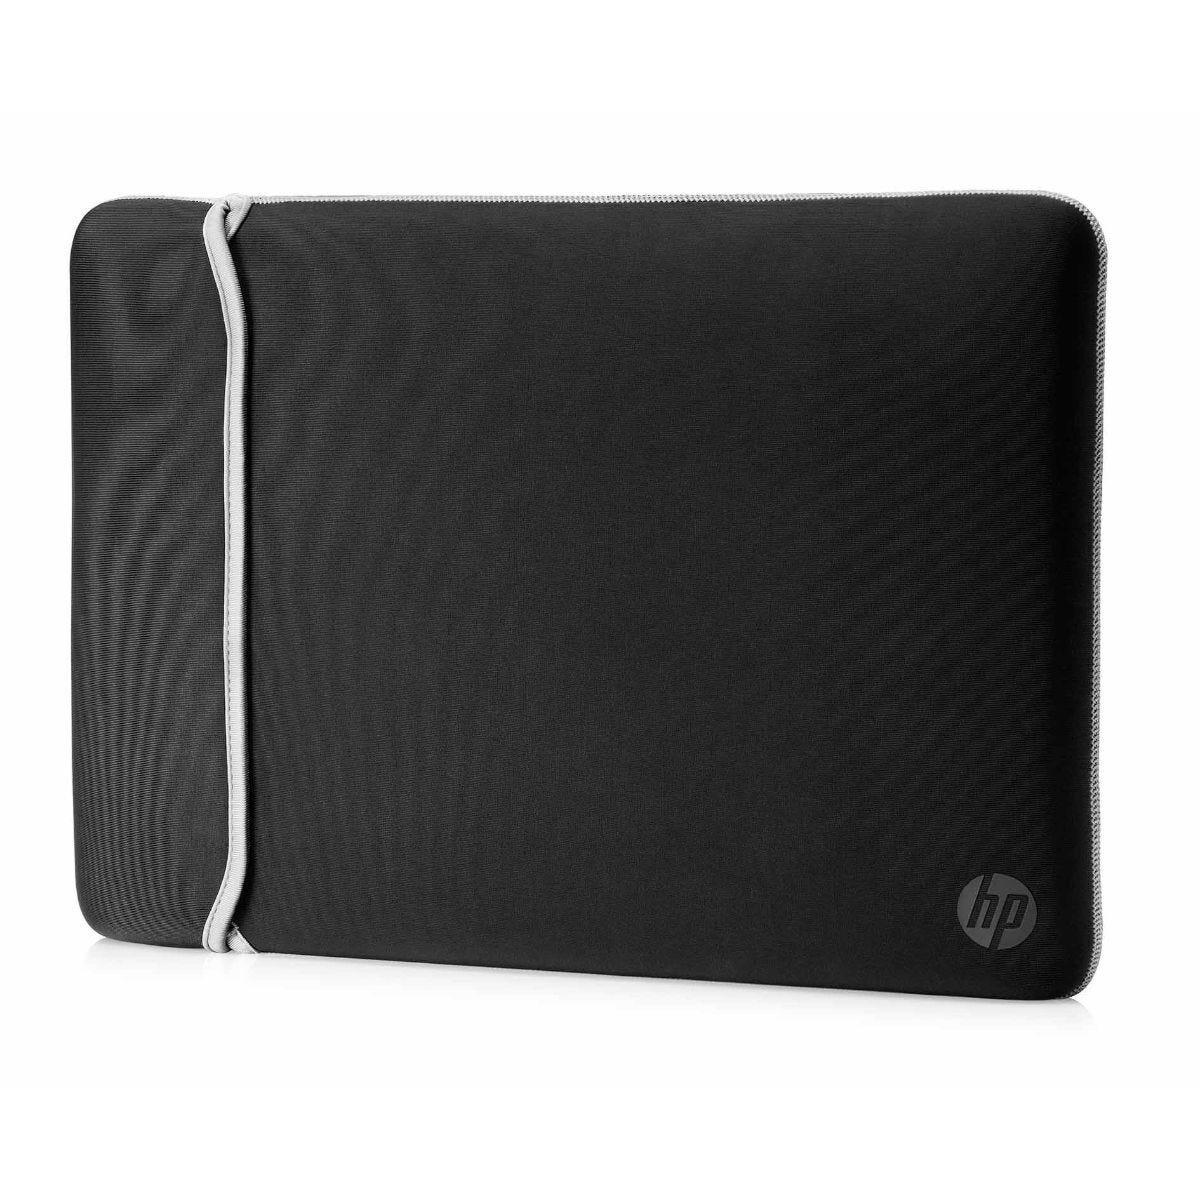 HP Neoprene 15 Inch Reversible Laptop Sleeve - Black and Silver